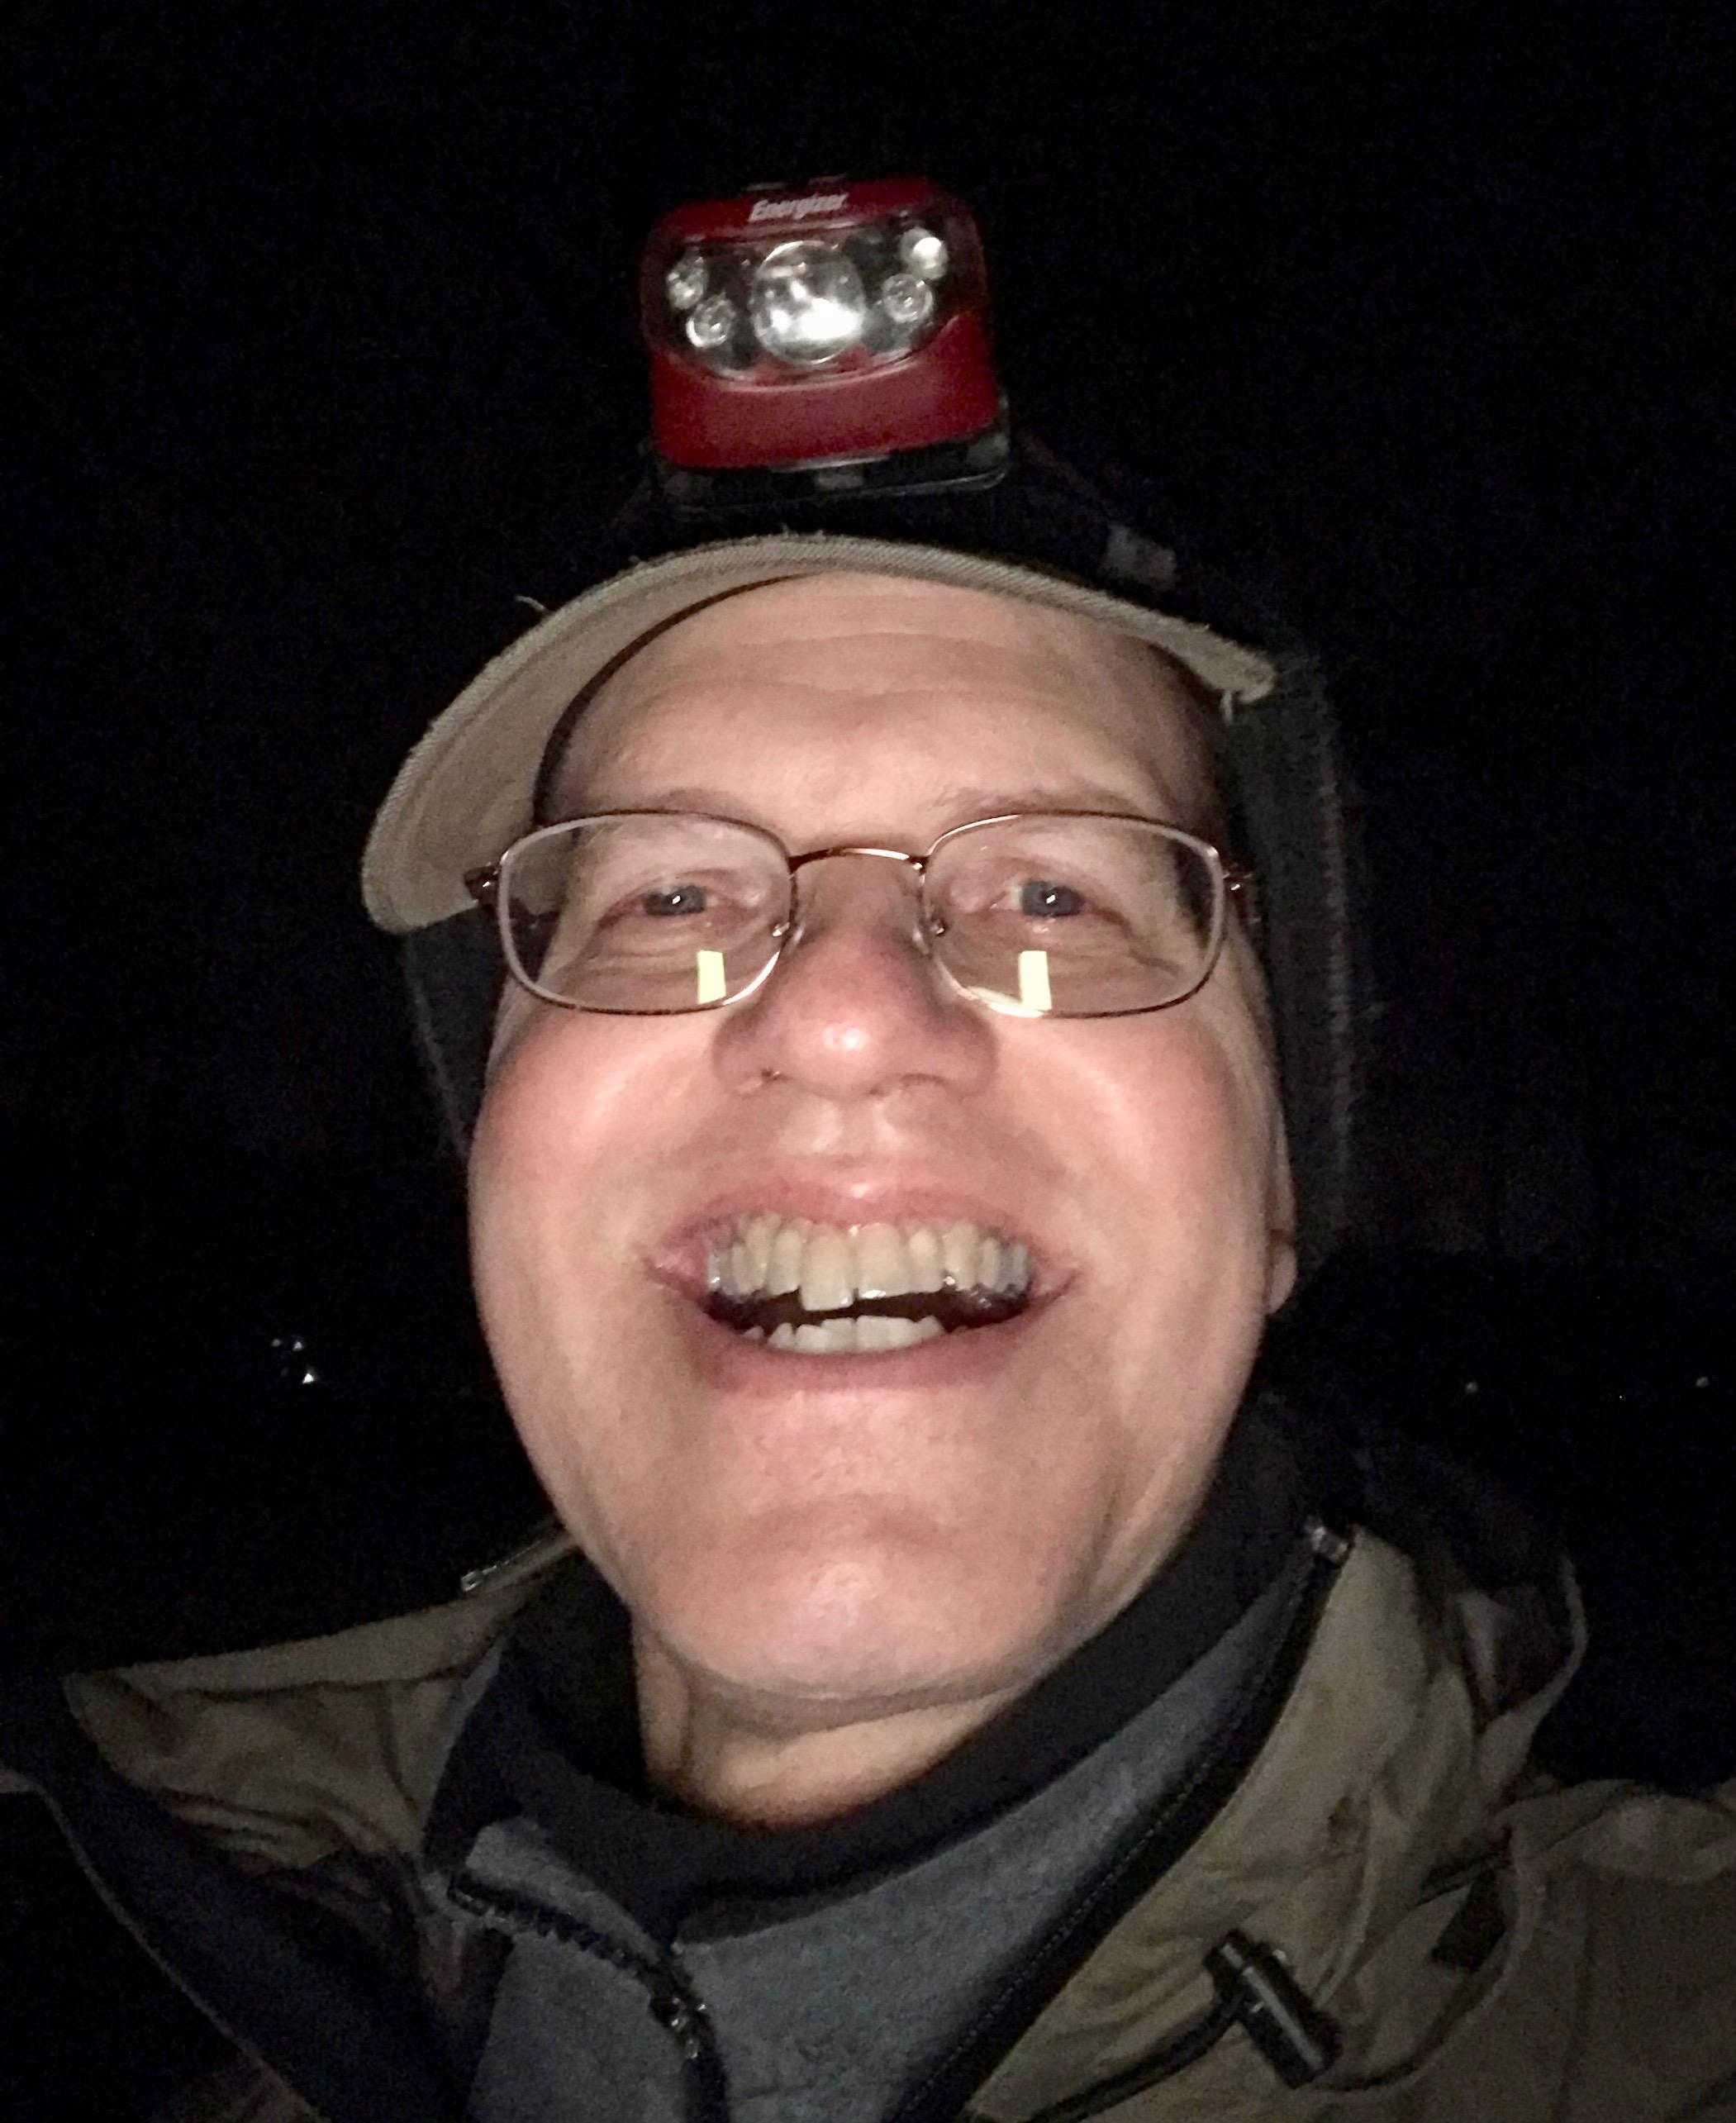 Flashlight hat man